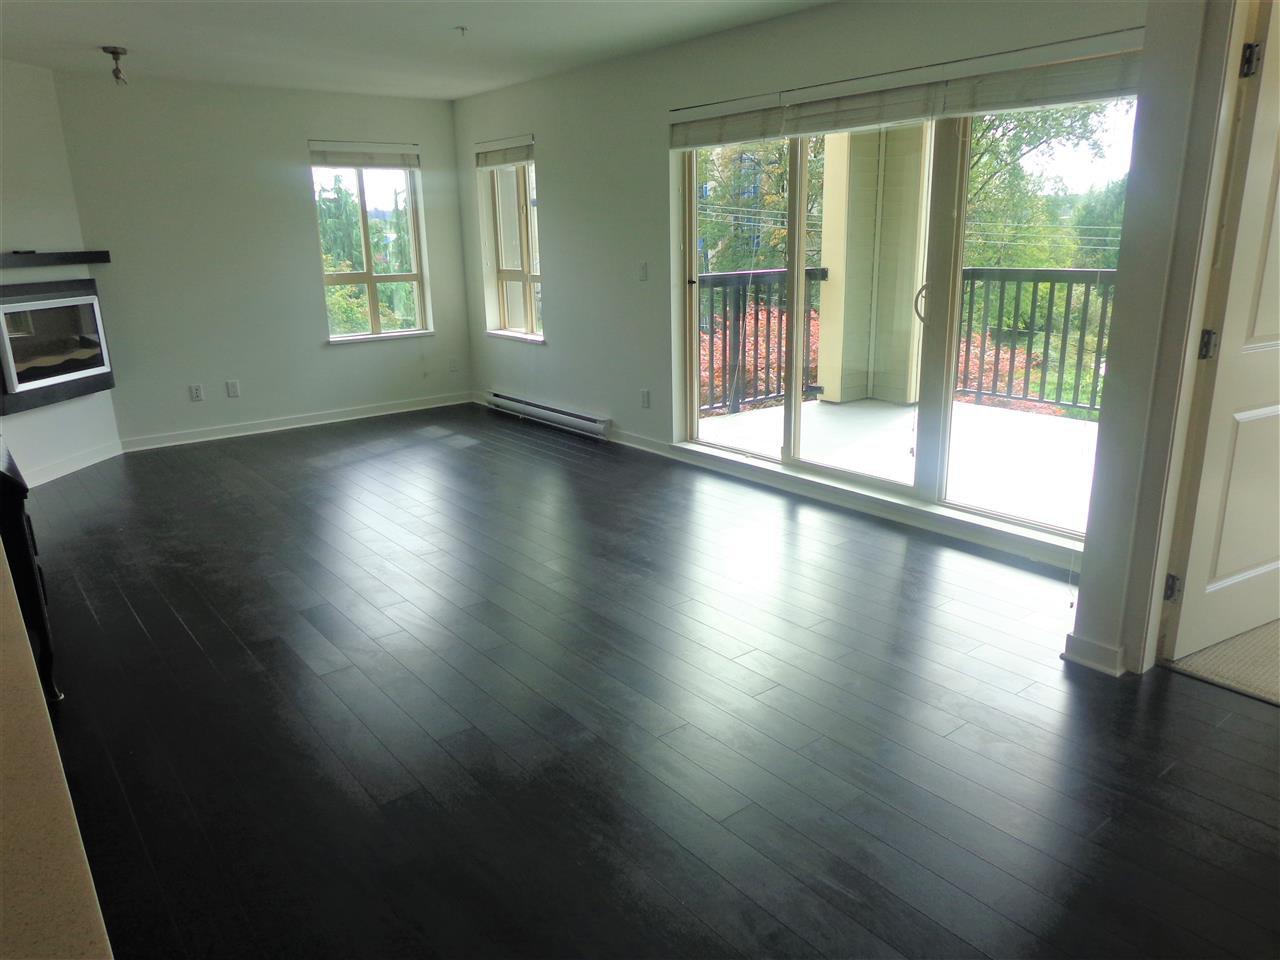 "Photo 7: Photos: 321 21009 56 Avenue in Langley: Salmon River Condo for sale in ""CORNERSTONE"" : MLS®# R2409598"